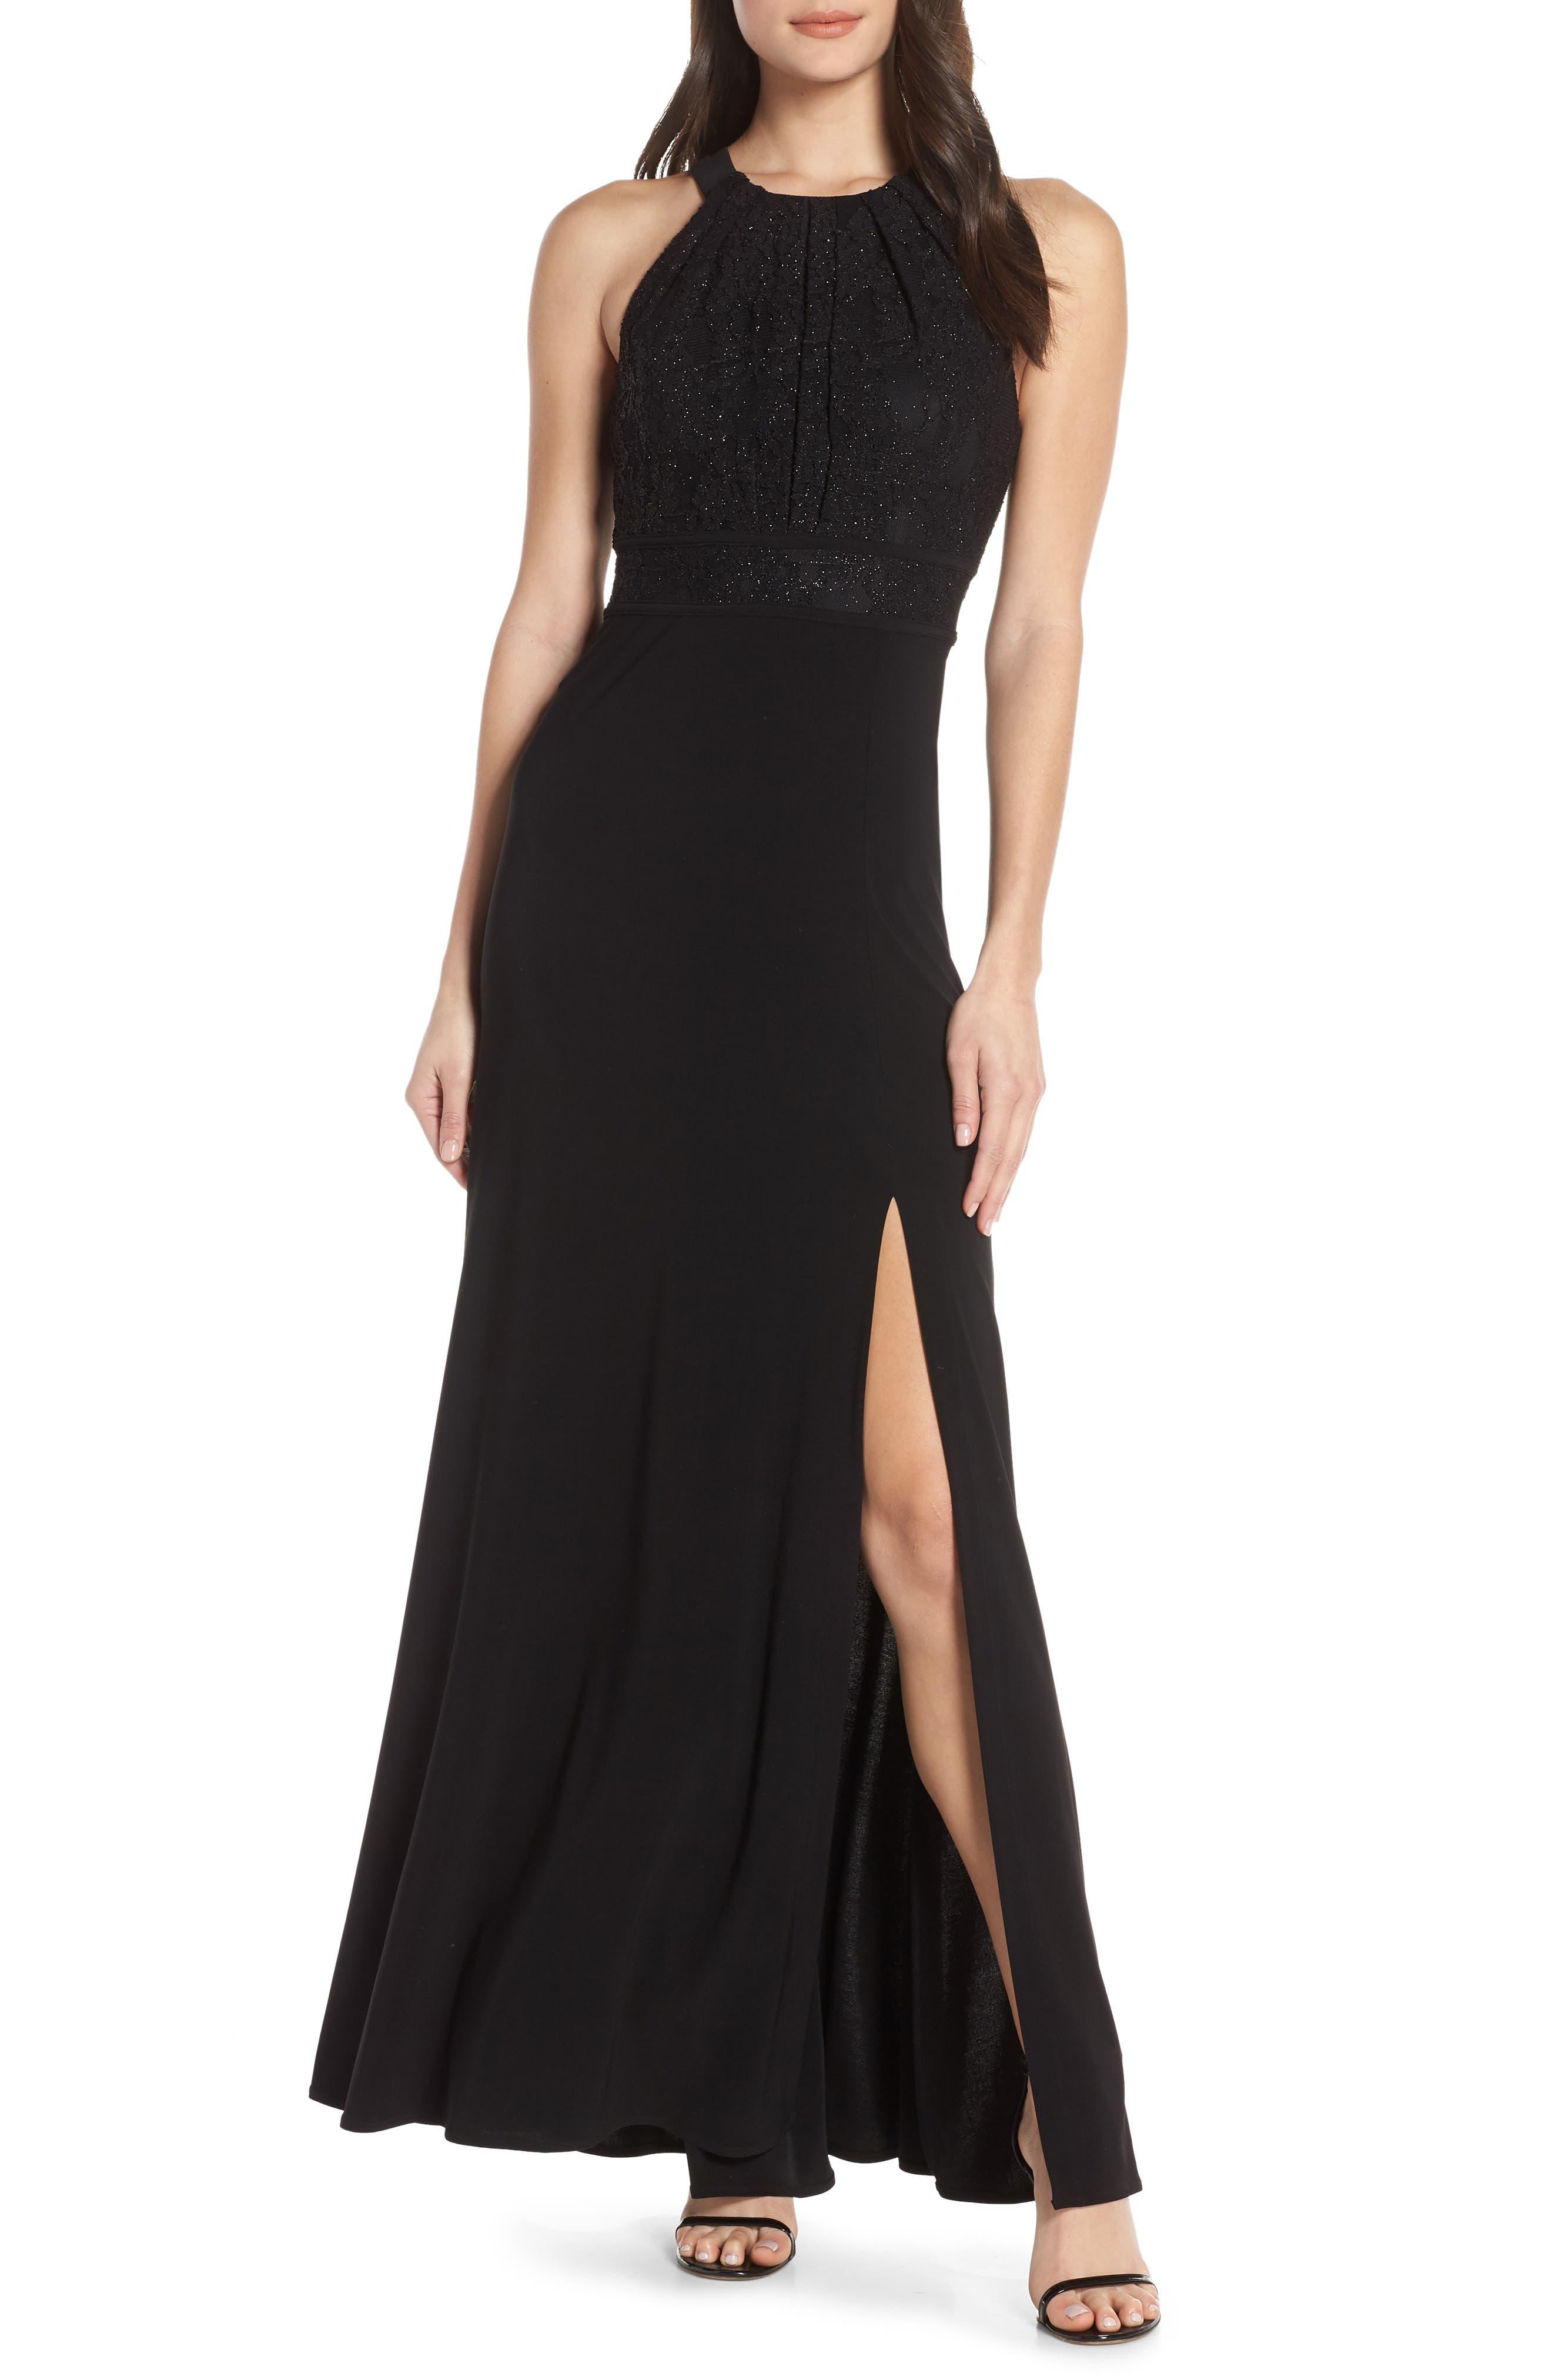 MORGAN & CO. Pleat Lace Bodice Evening Dress, Main, color, BLACK